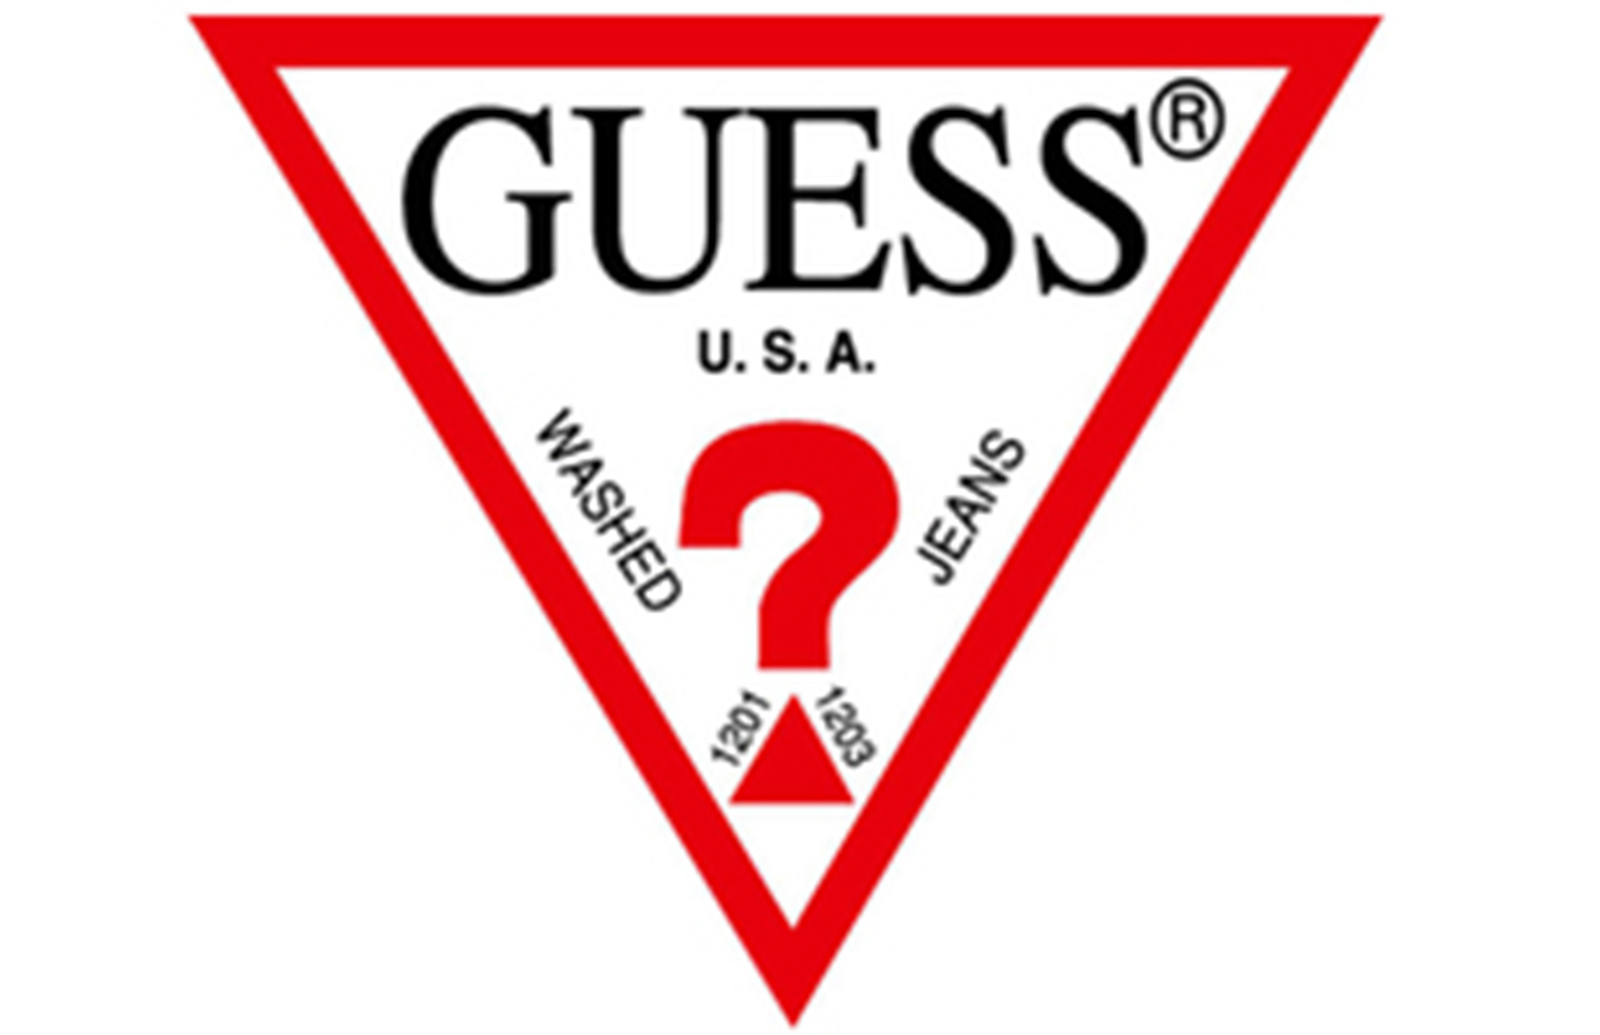 guess+logo.jpg